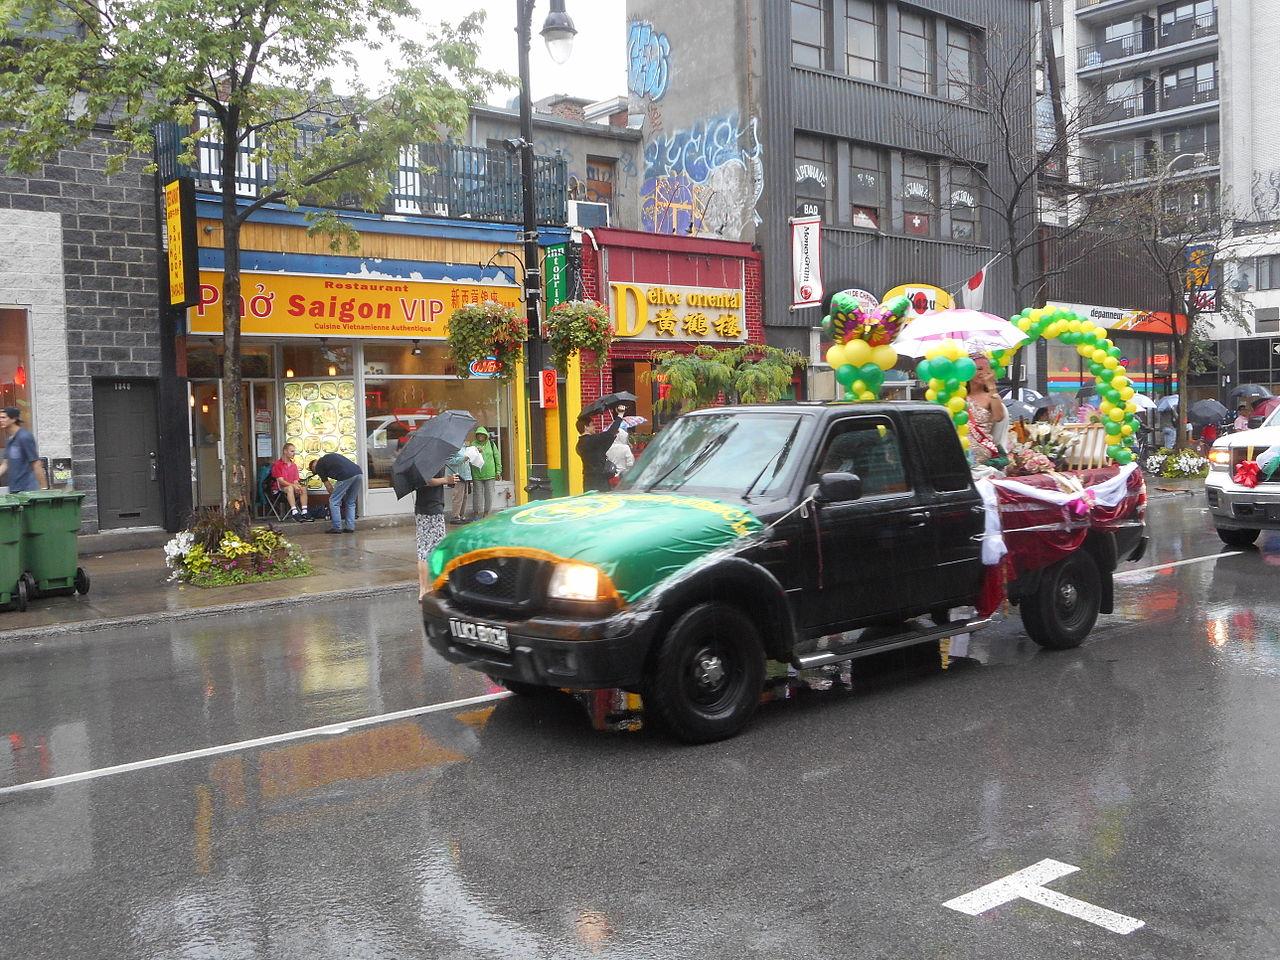 File:Canada Day 2015 on Saint Catherine Street - 275.jpg - Wikimedia